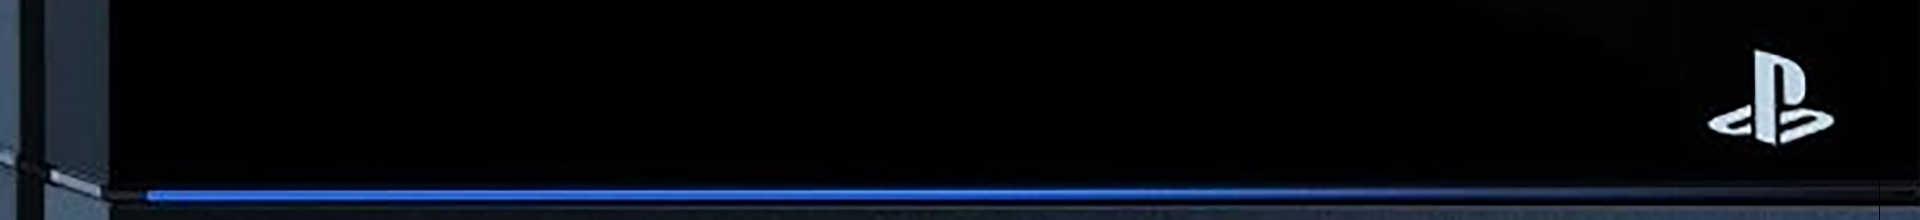 2013 - PlayStation 4